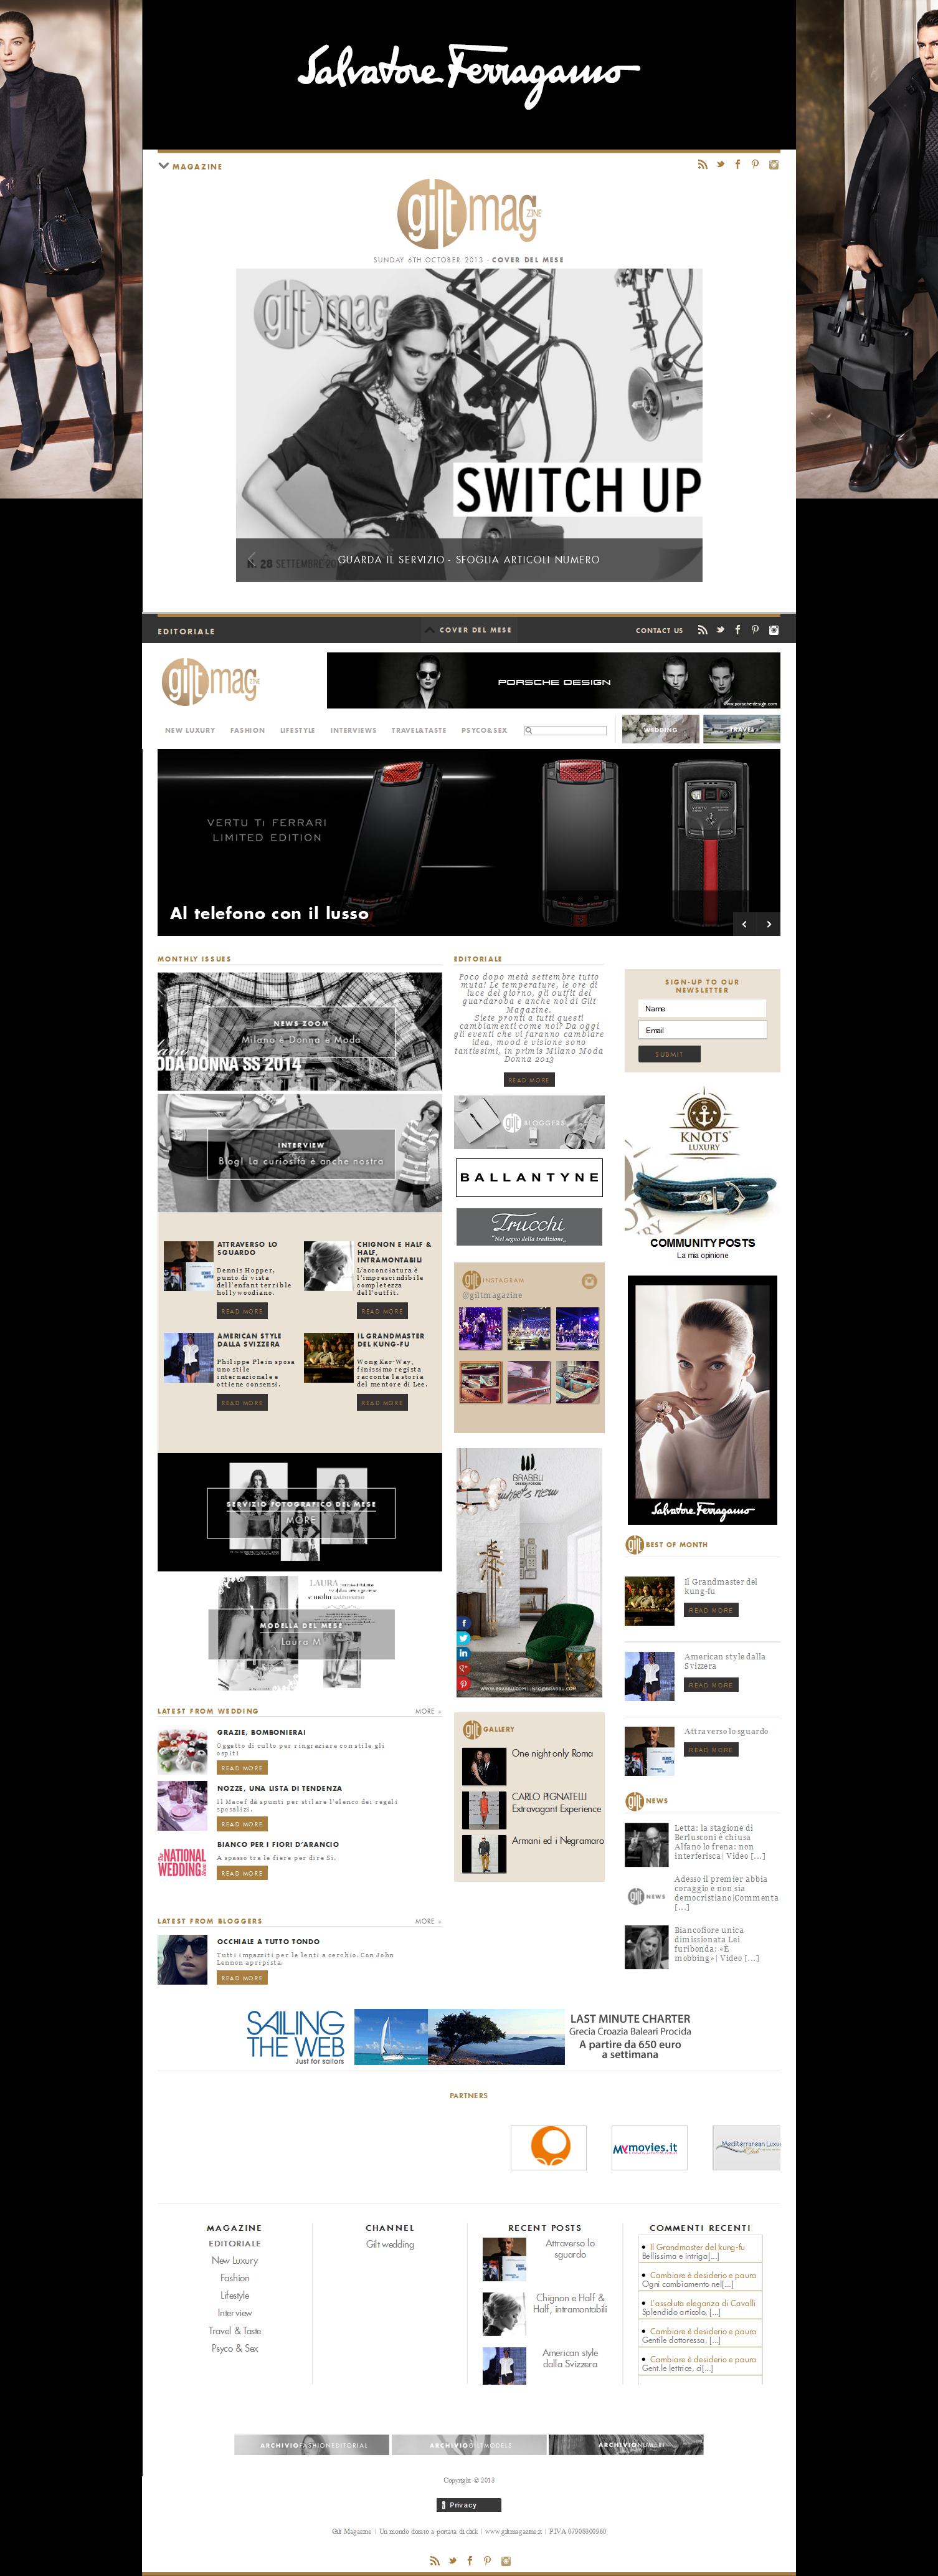 Gilt magazine Web site